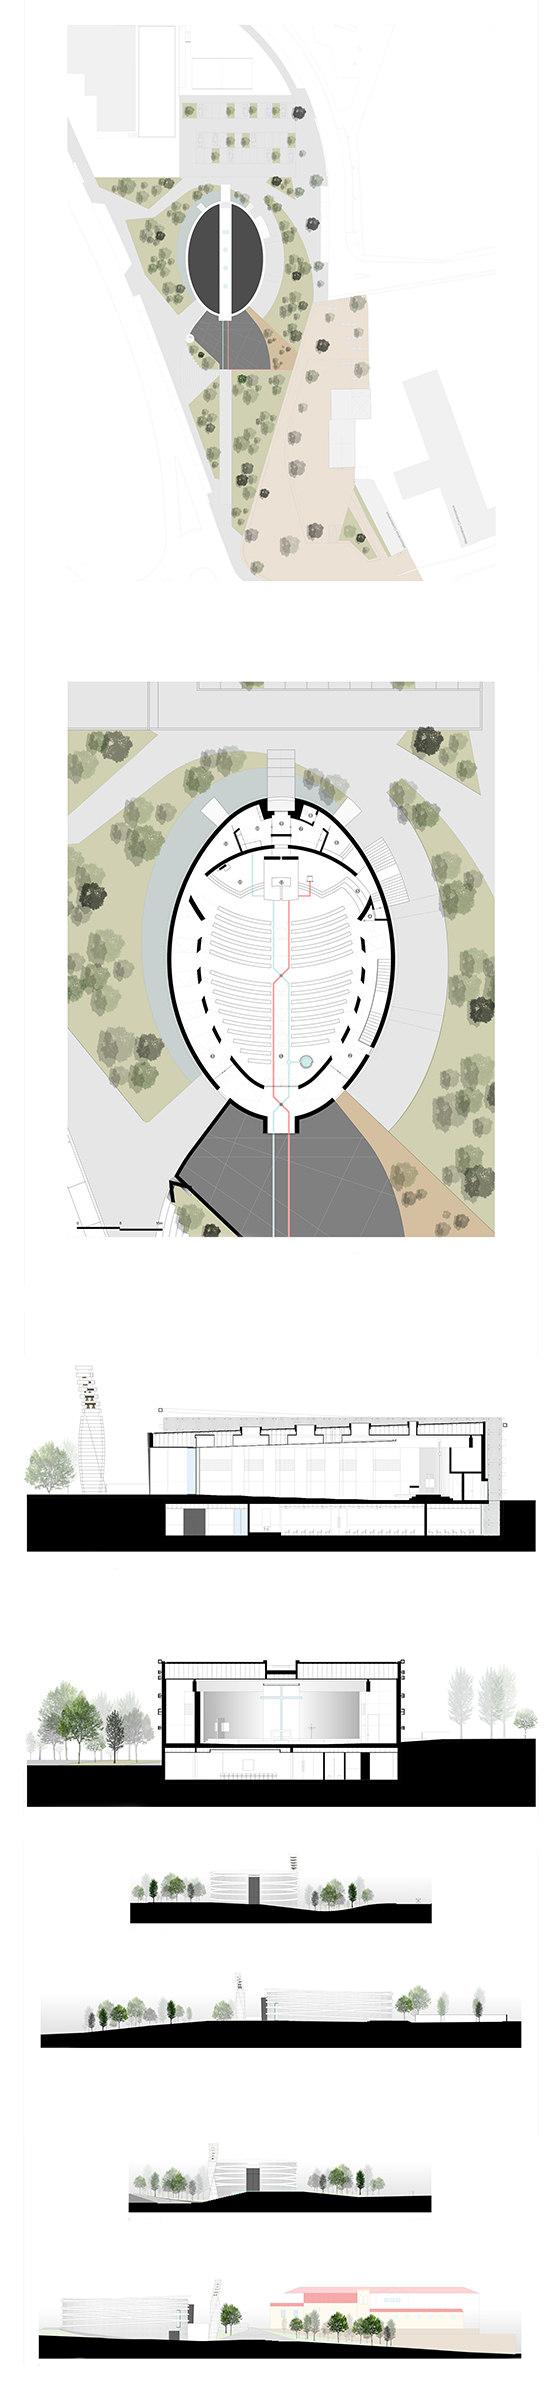 Church of S. Tiago de Antas by Hugo Correia | Church architecture / community centres